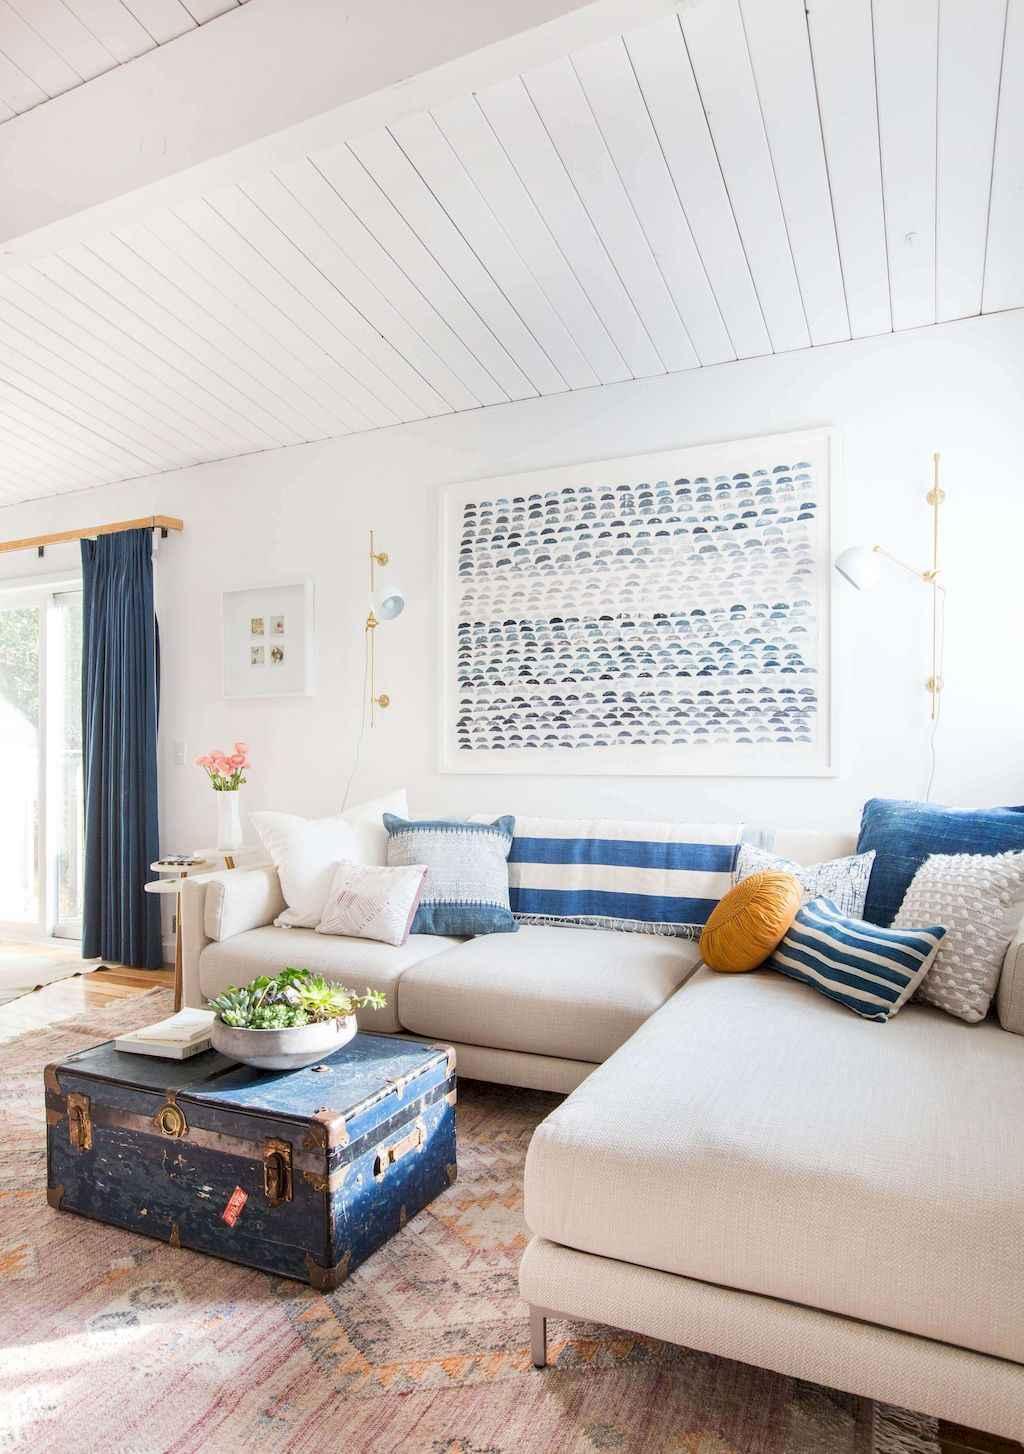 60 modern farmhouse living room first apartment ideas 57 for First apartment living room ideas